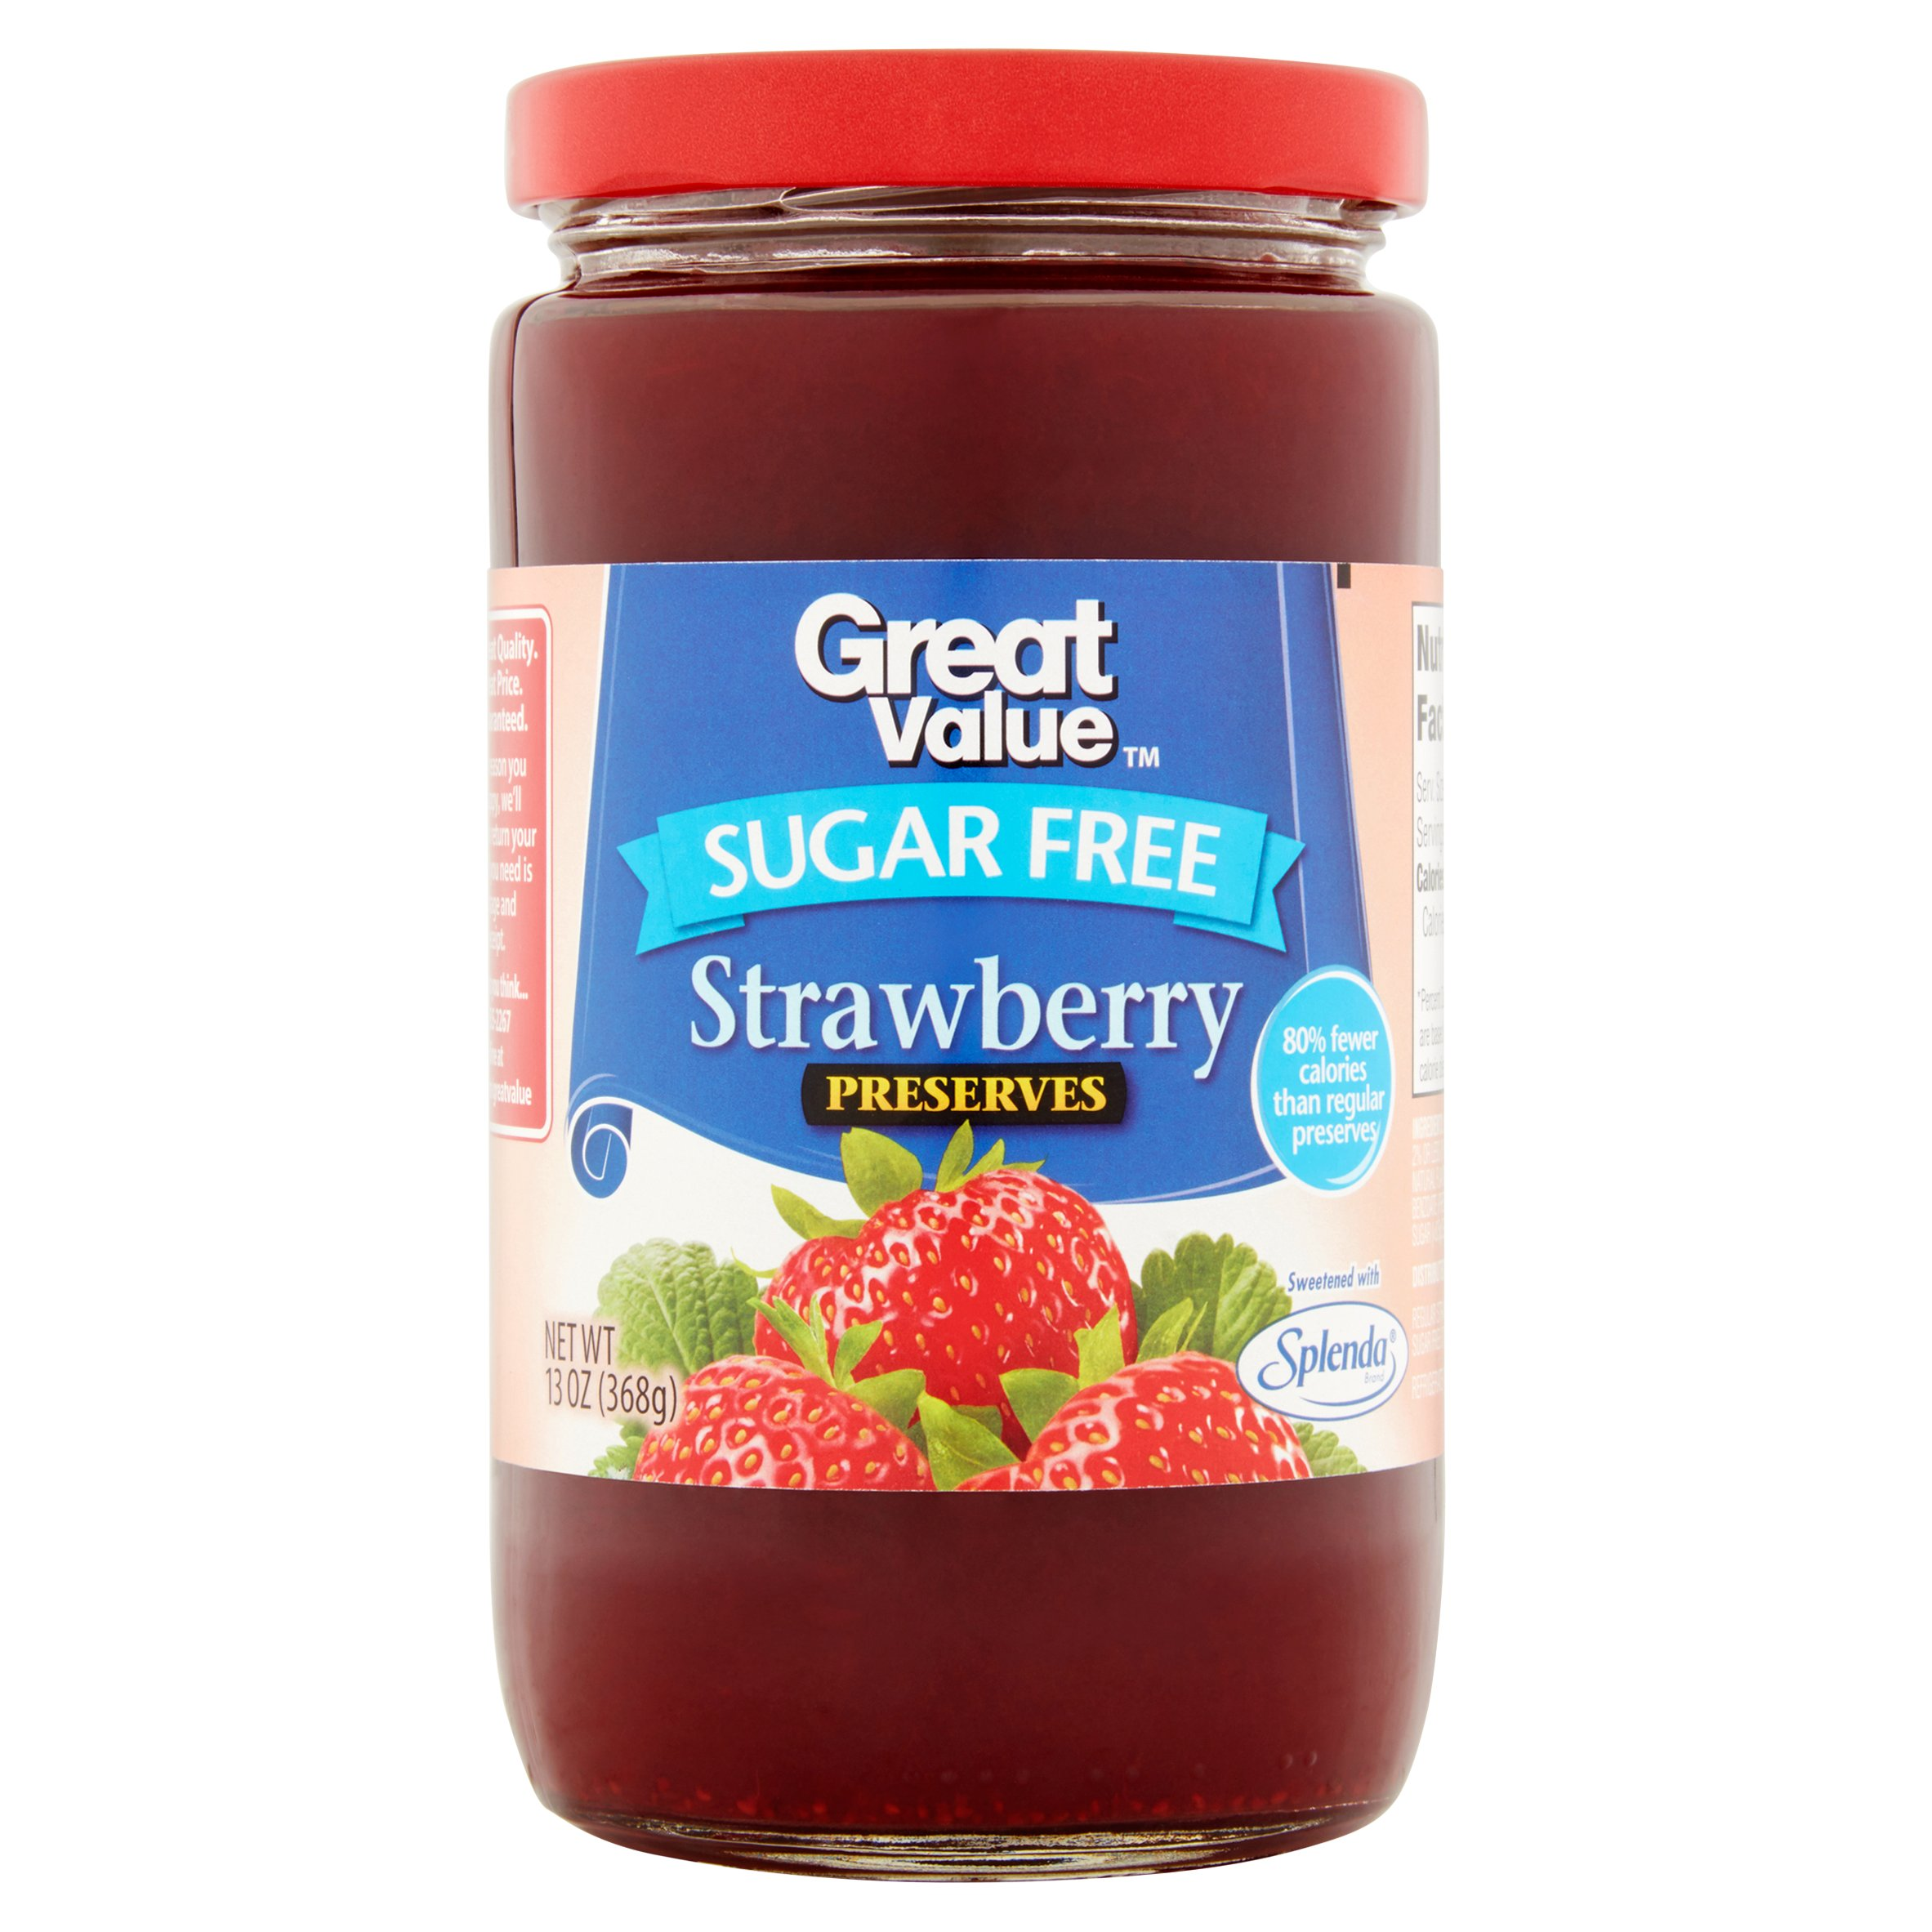 Great Value Sugar Free Strawberry Preserves, 13 oz